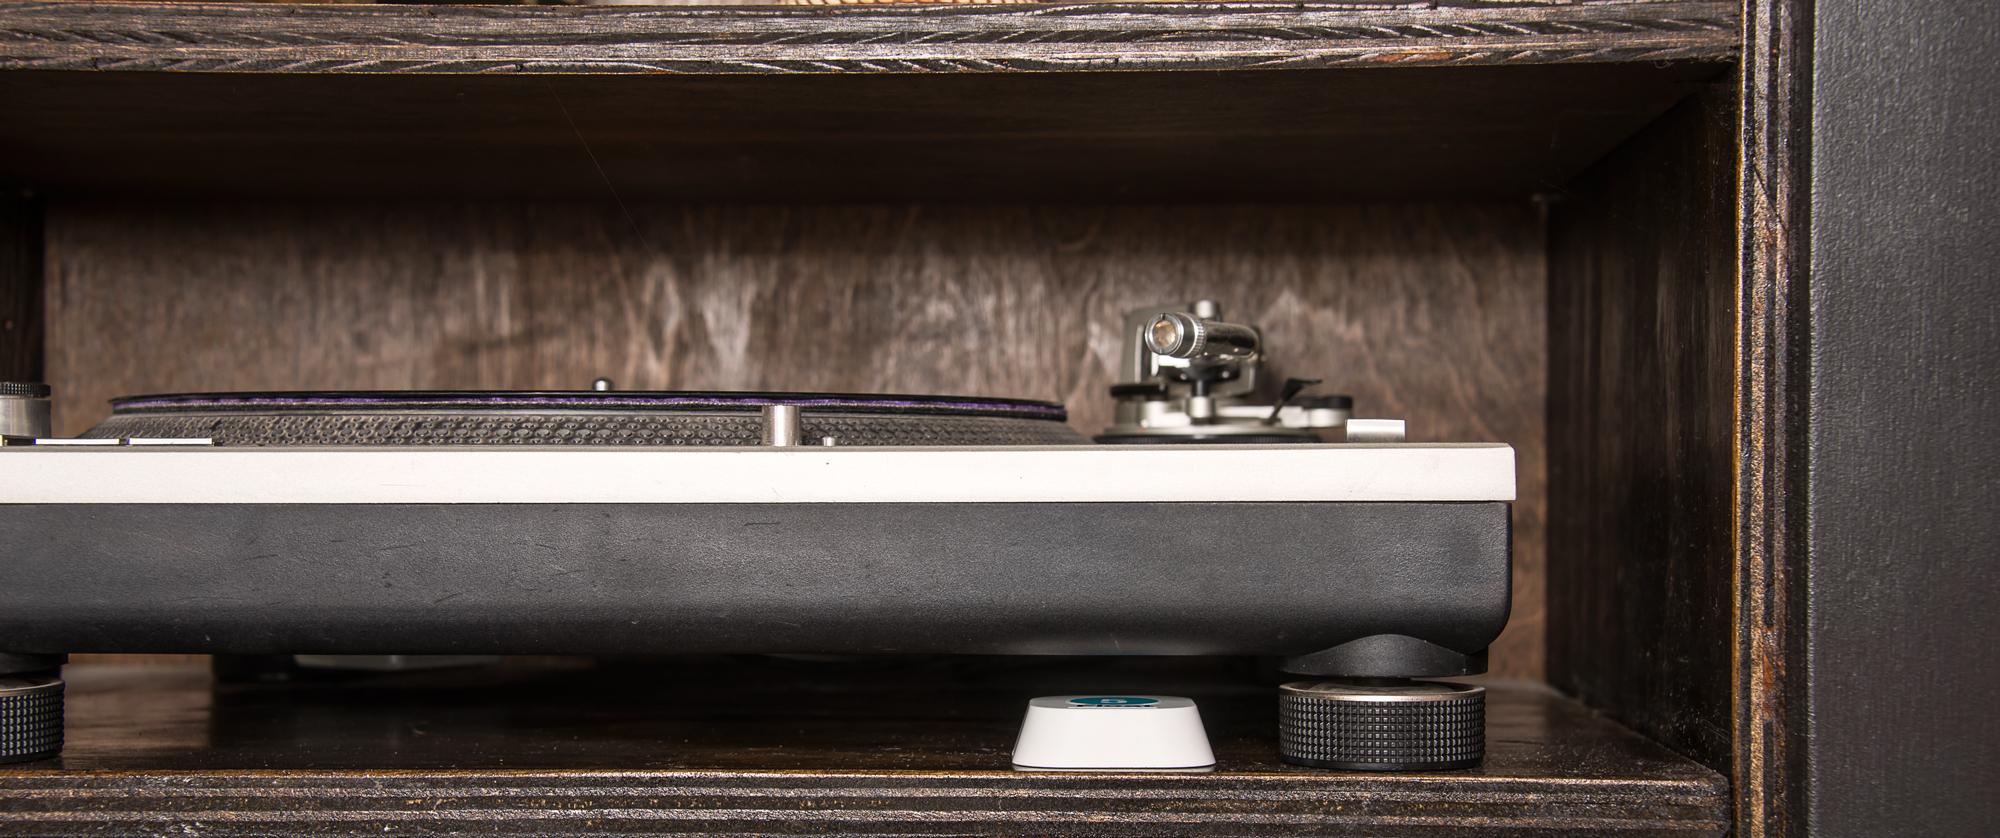 iBeacon hidden in entertainment cabinet